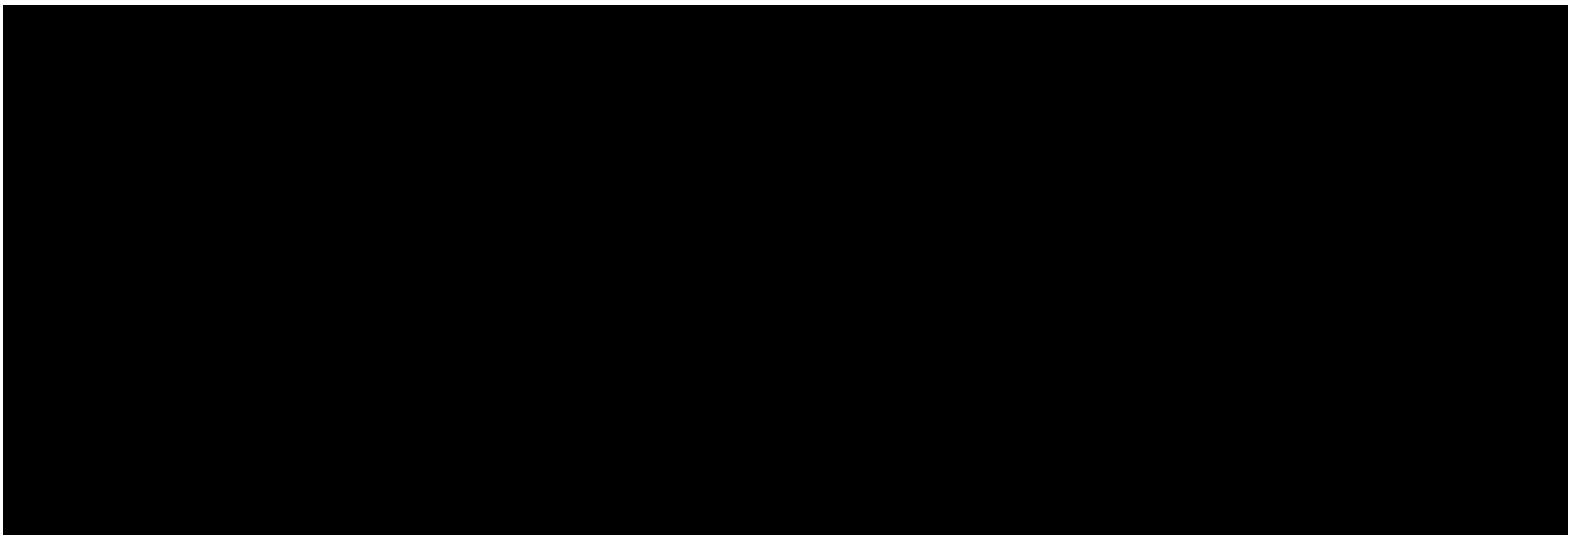 www.slyartwork.com Logo